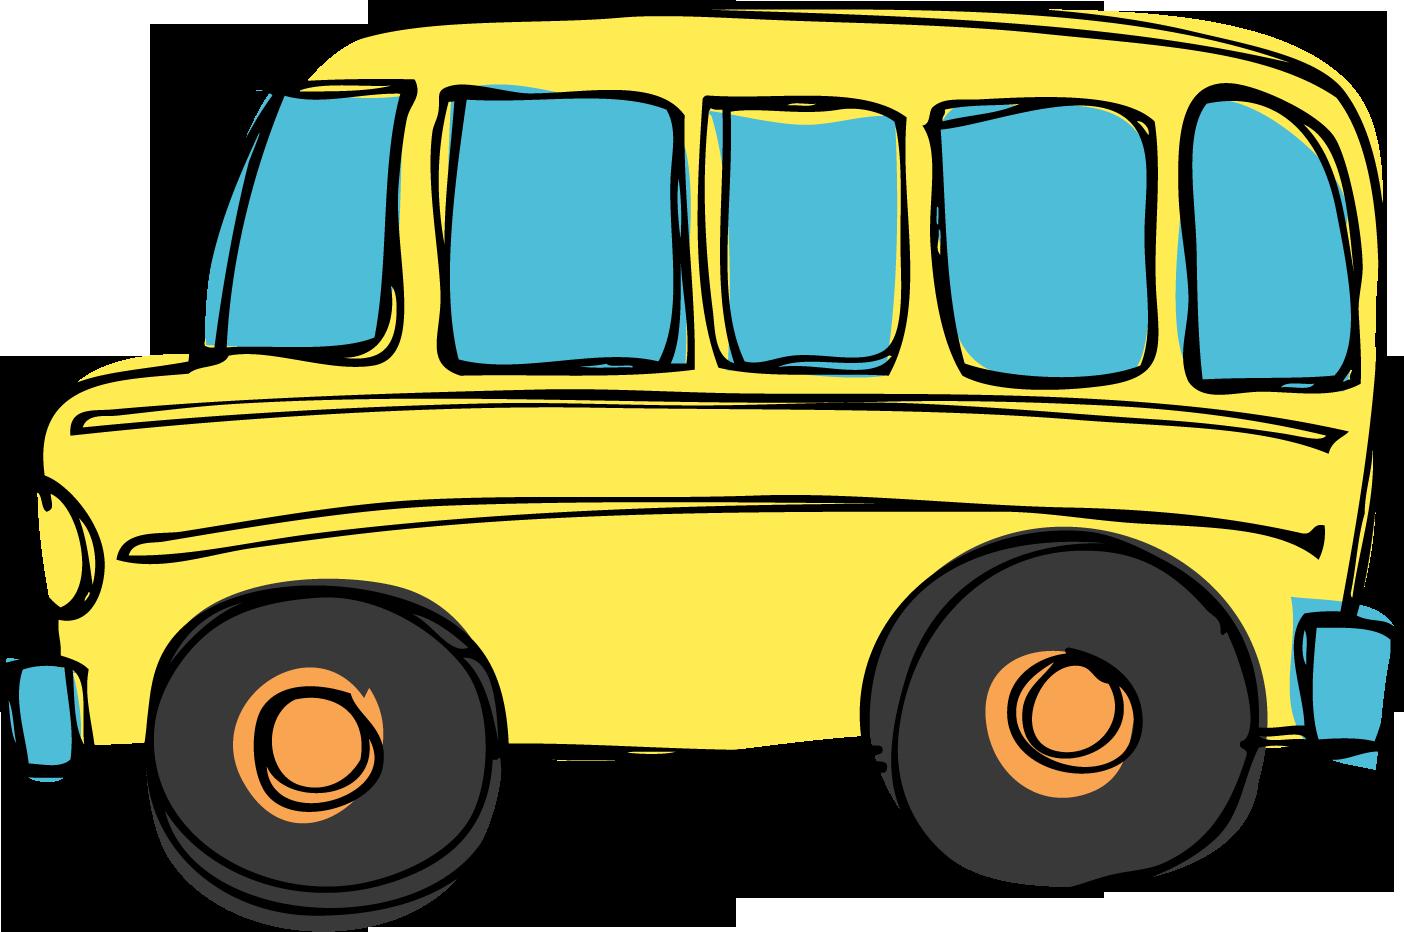 1404x932 School Bus Clip Art Black And White Image